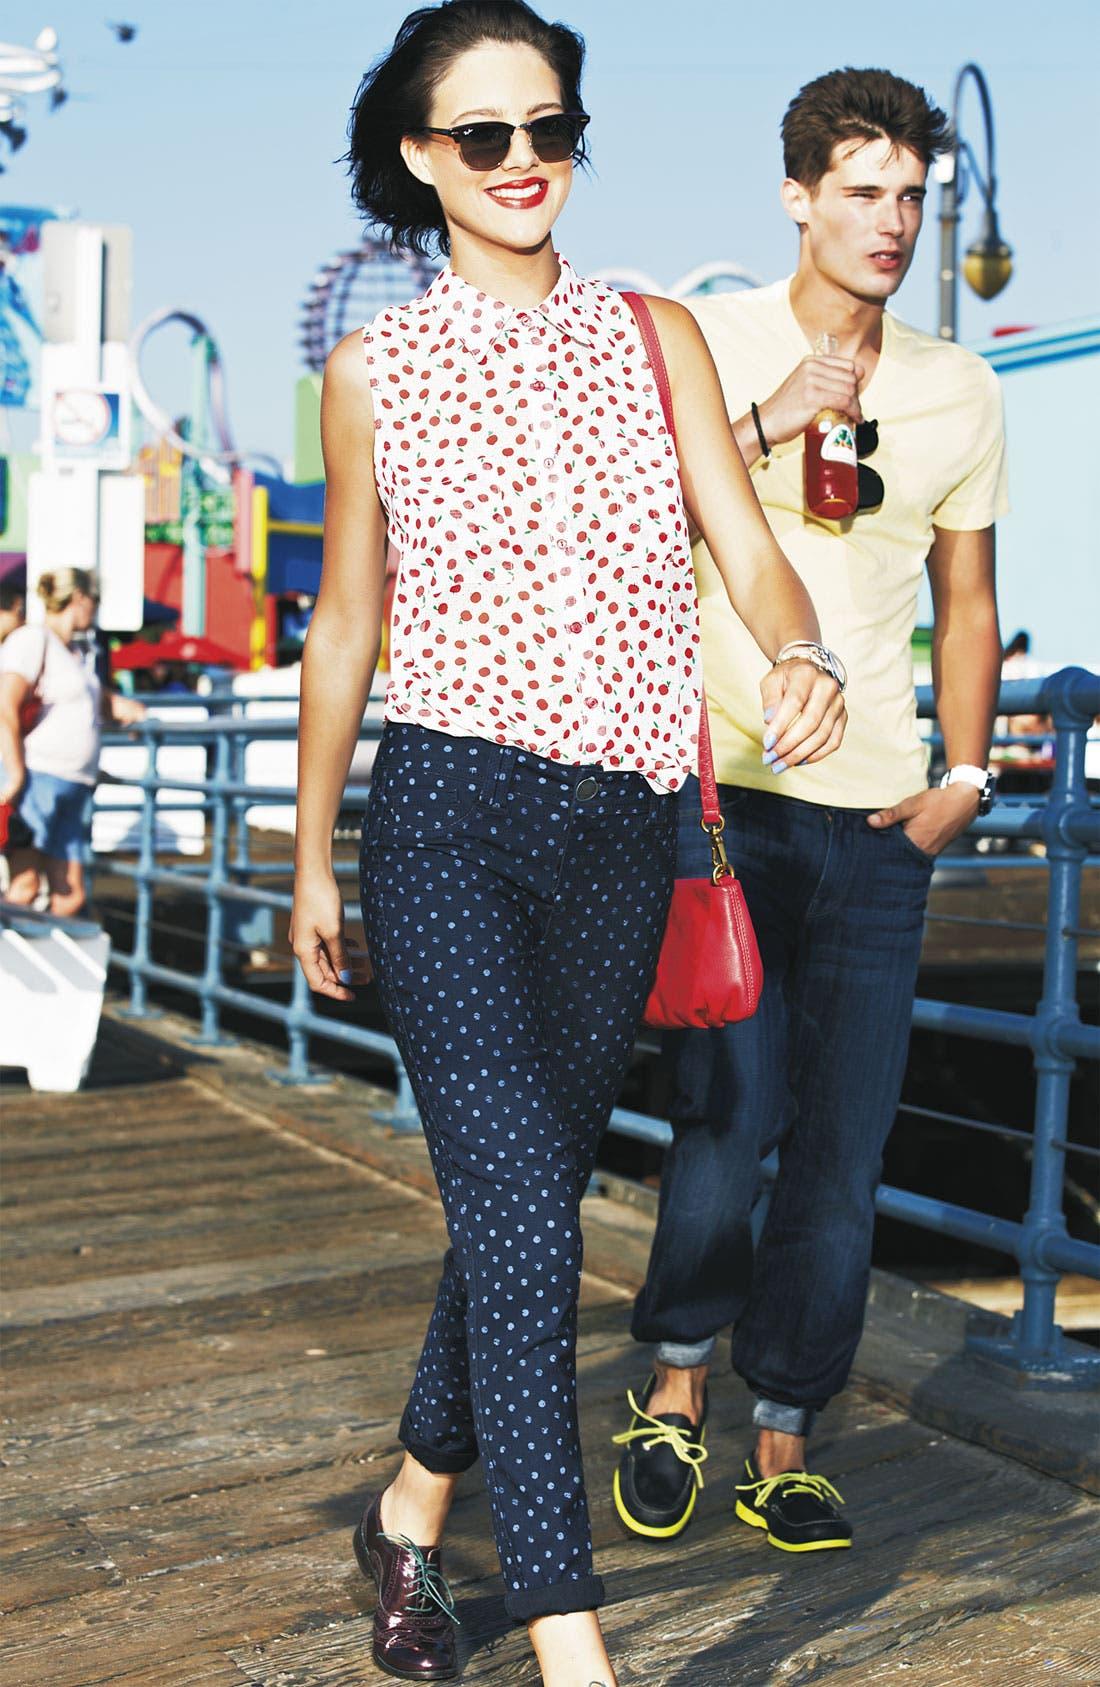 Main Image - MOD.lusive Blouse & Wit & Wisdom Jeans